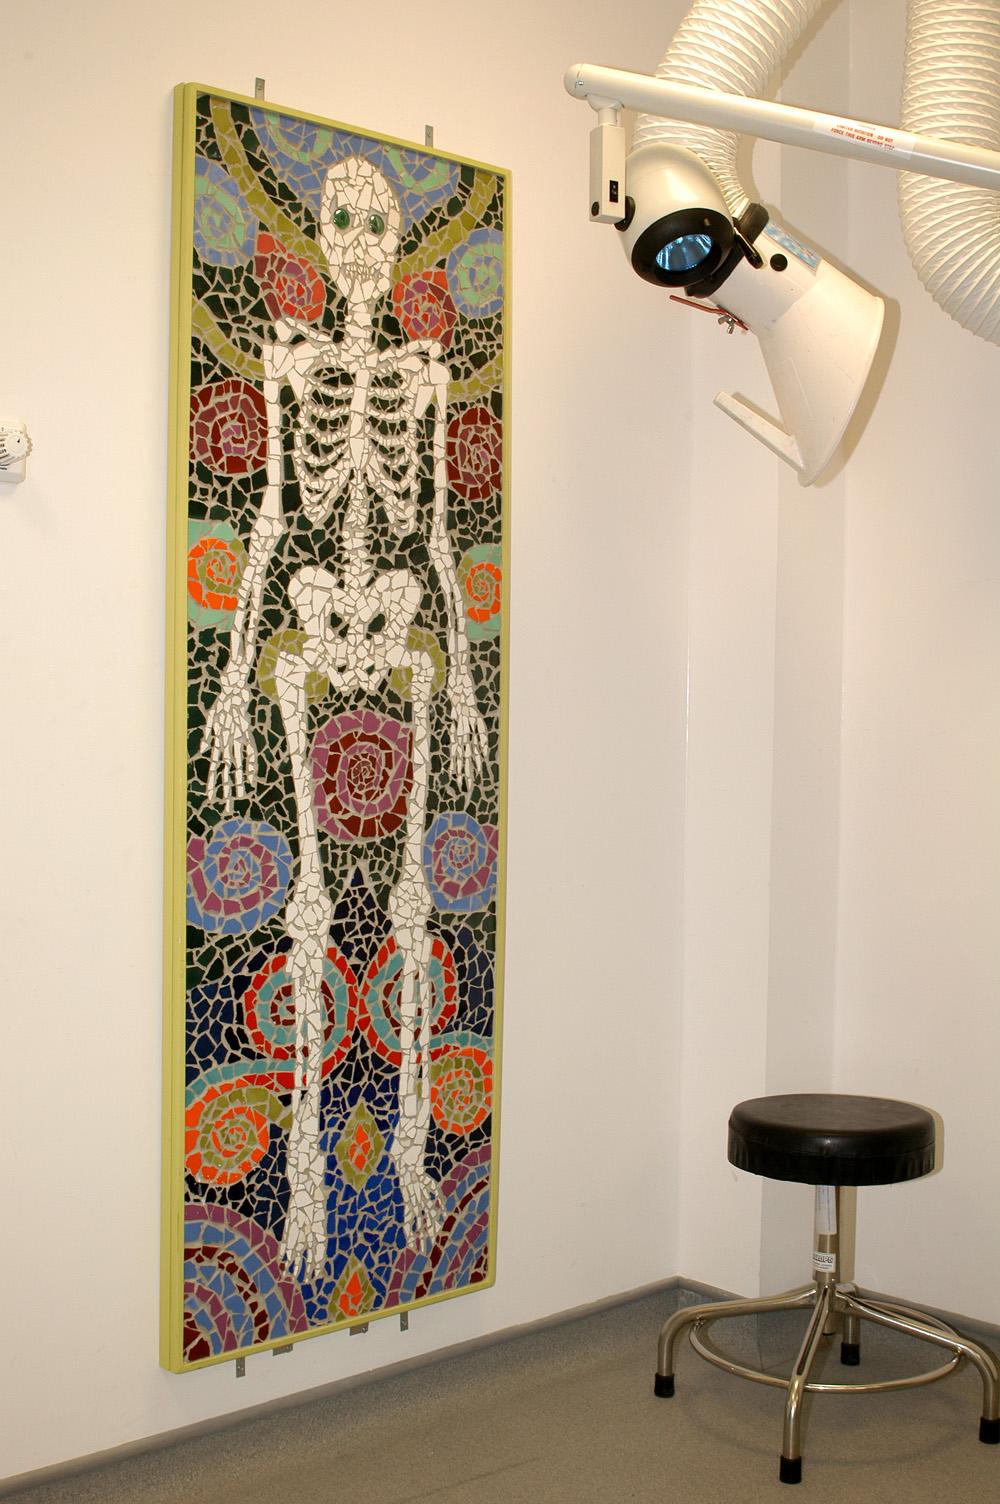 Skeleton mosaic, plaster room